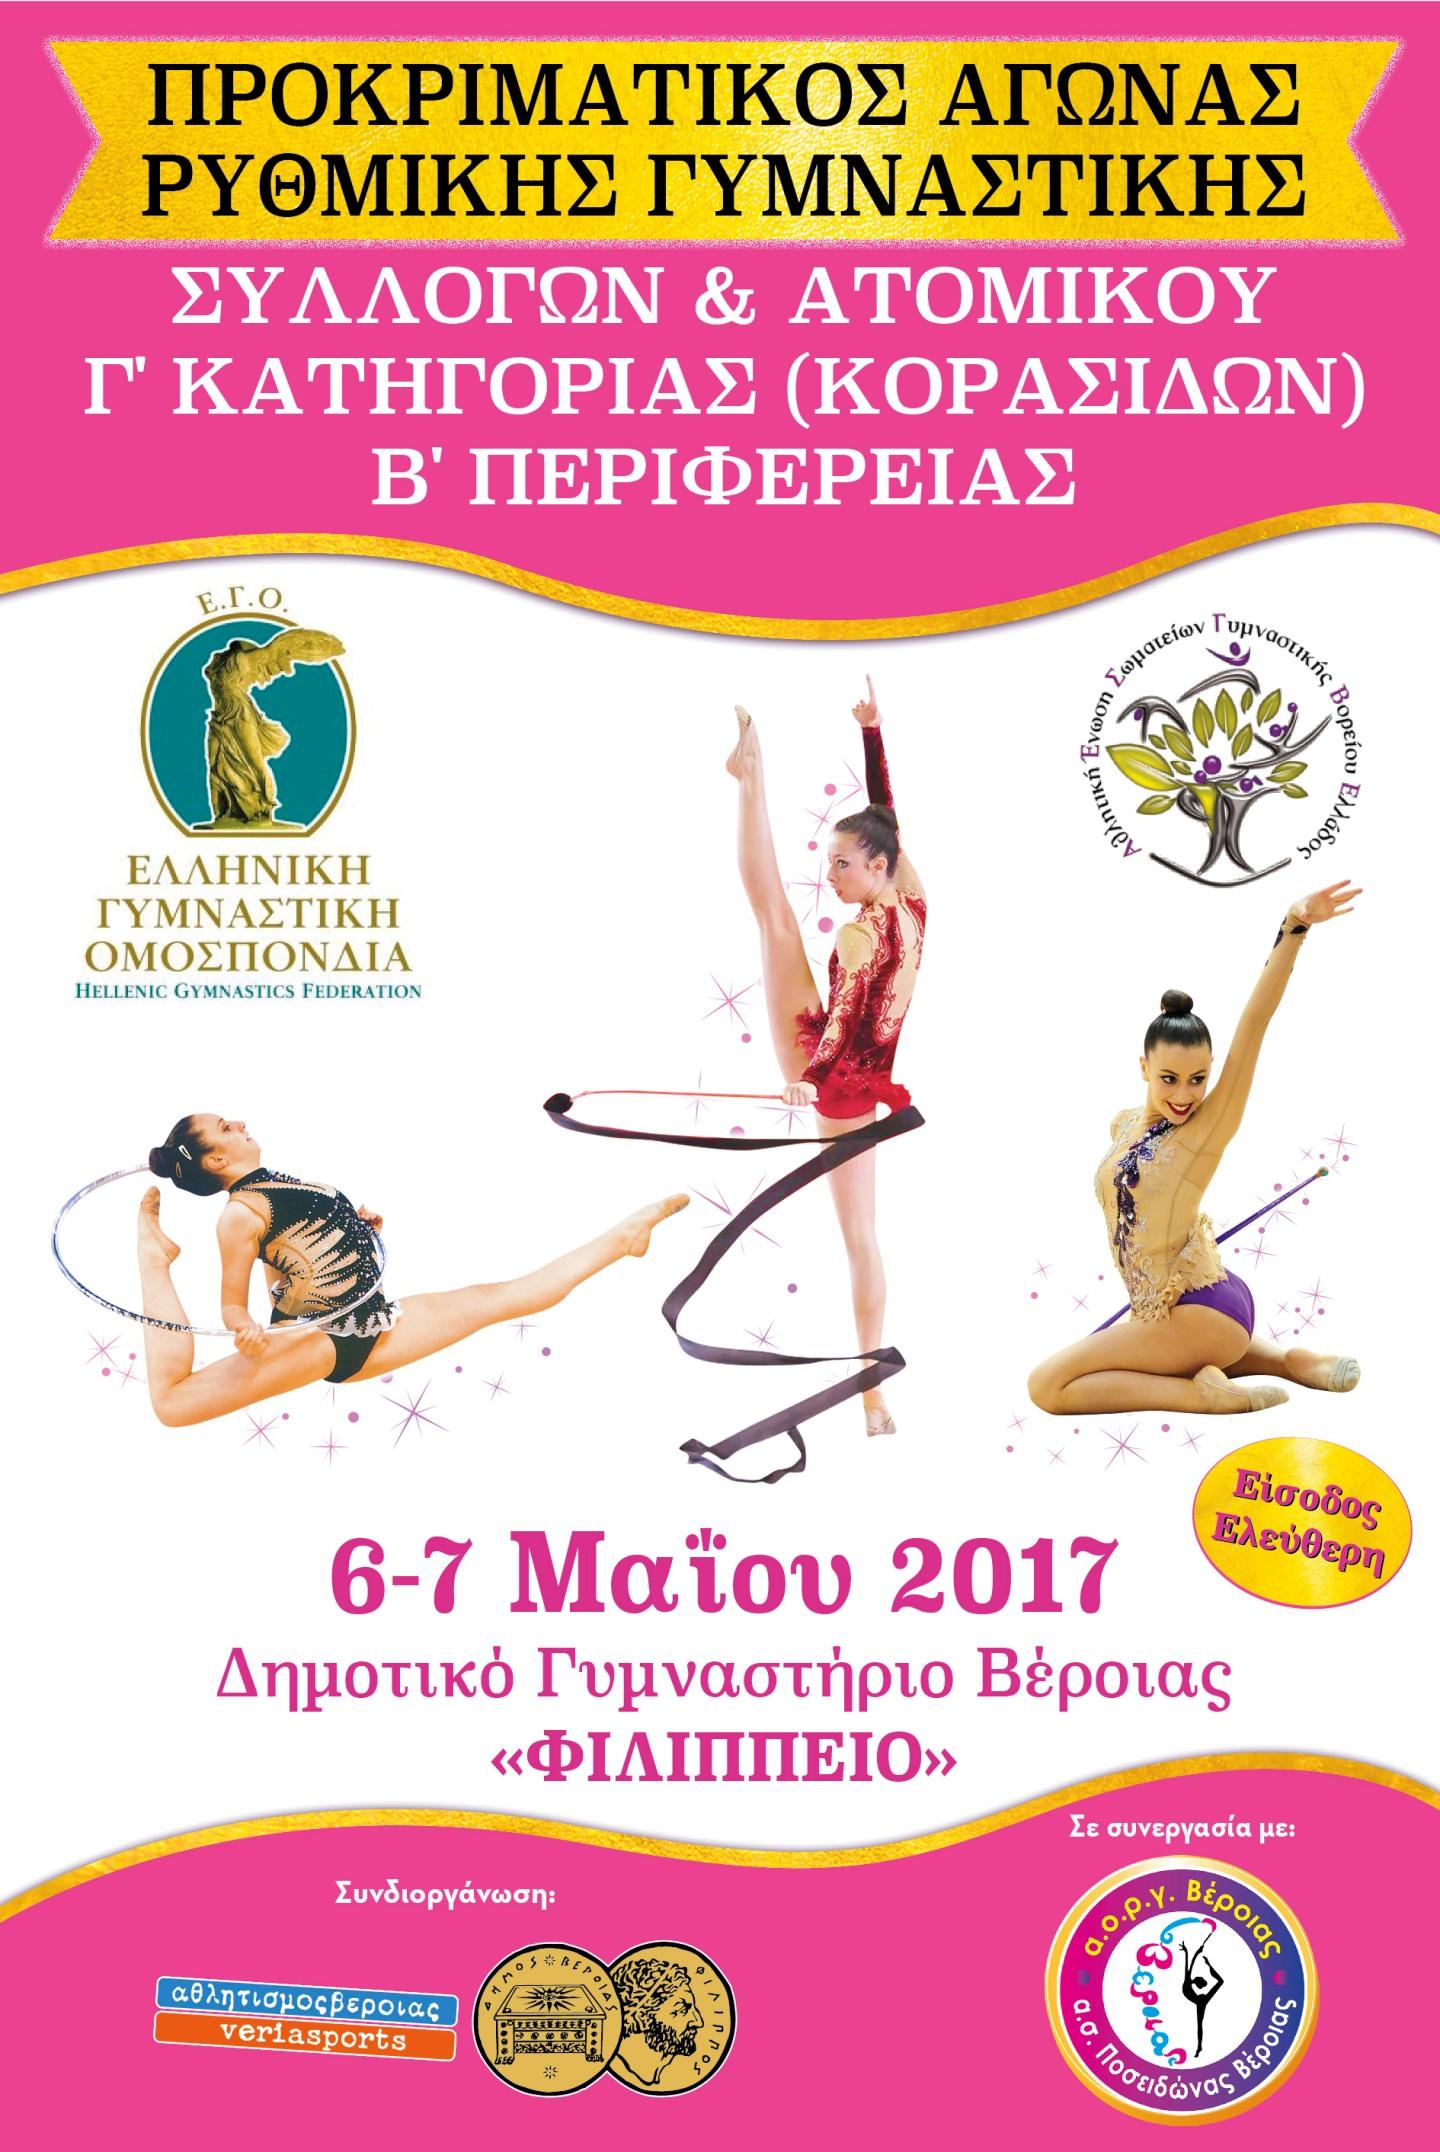 rythmiki-prokrimatikos_korasidon_2017-veria-afisa_big